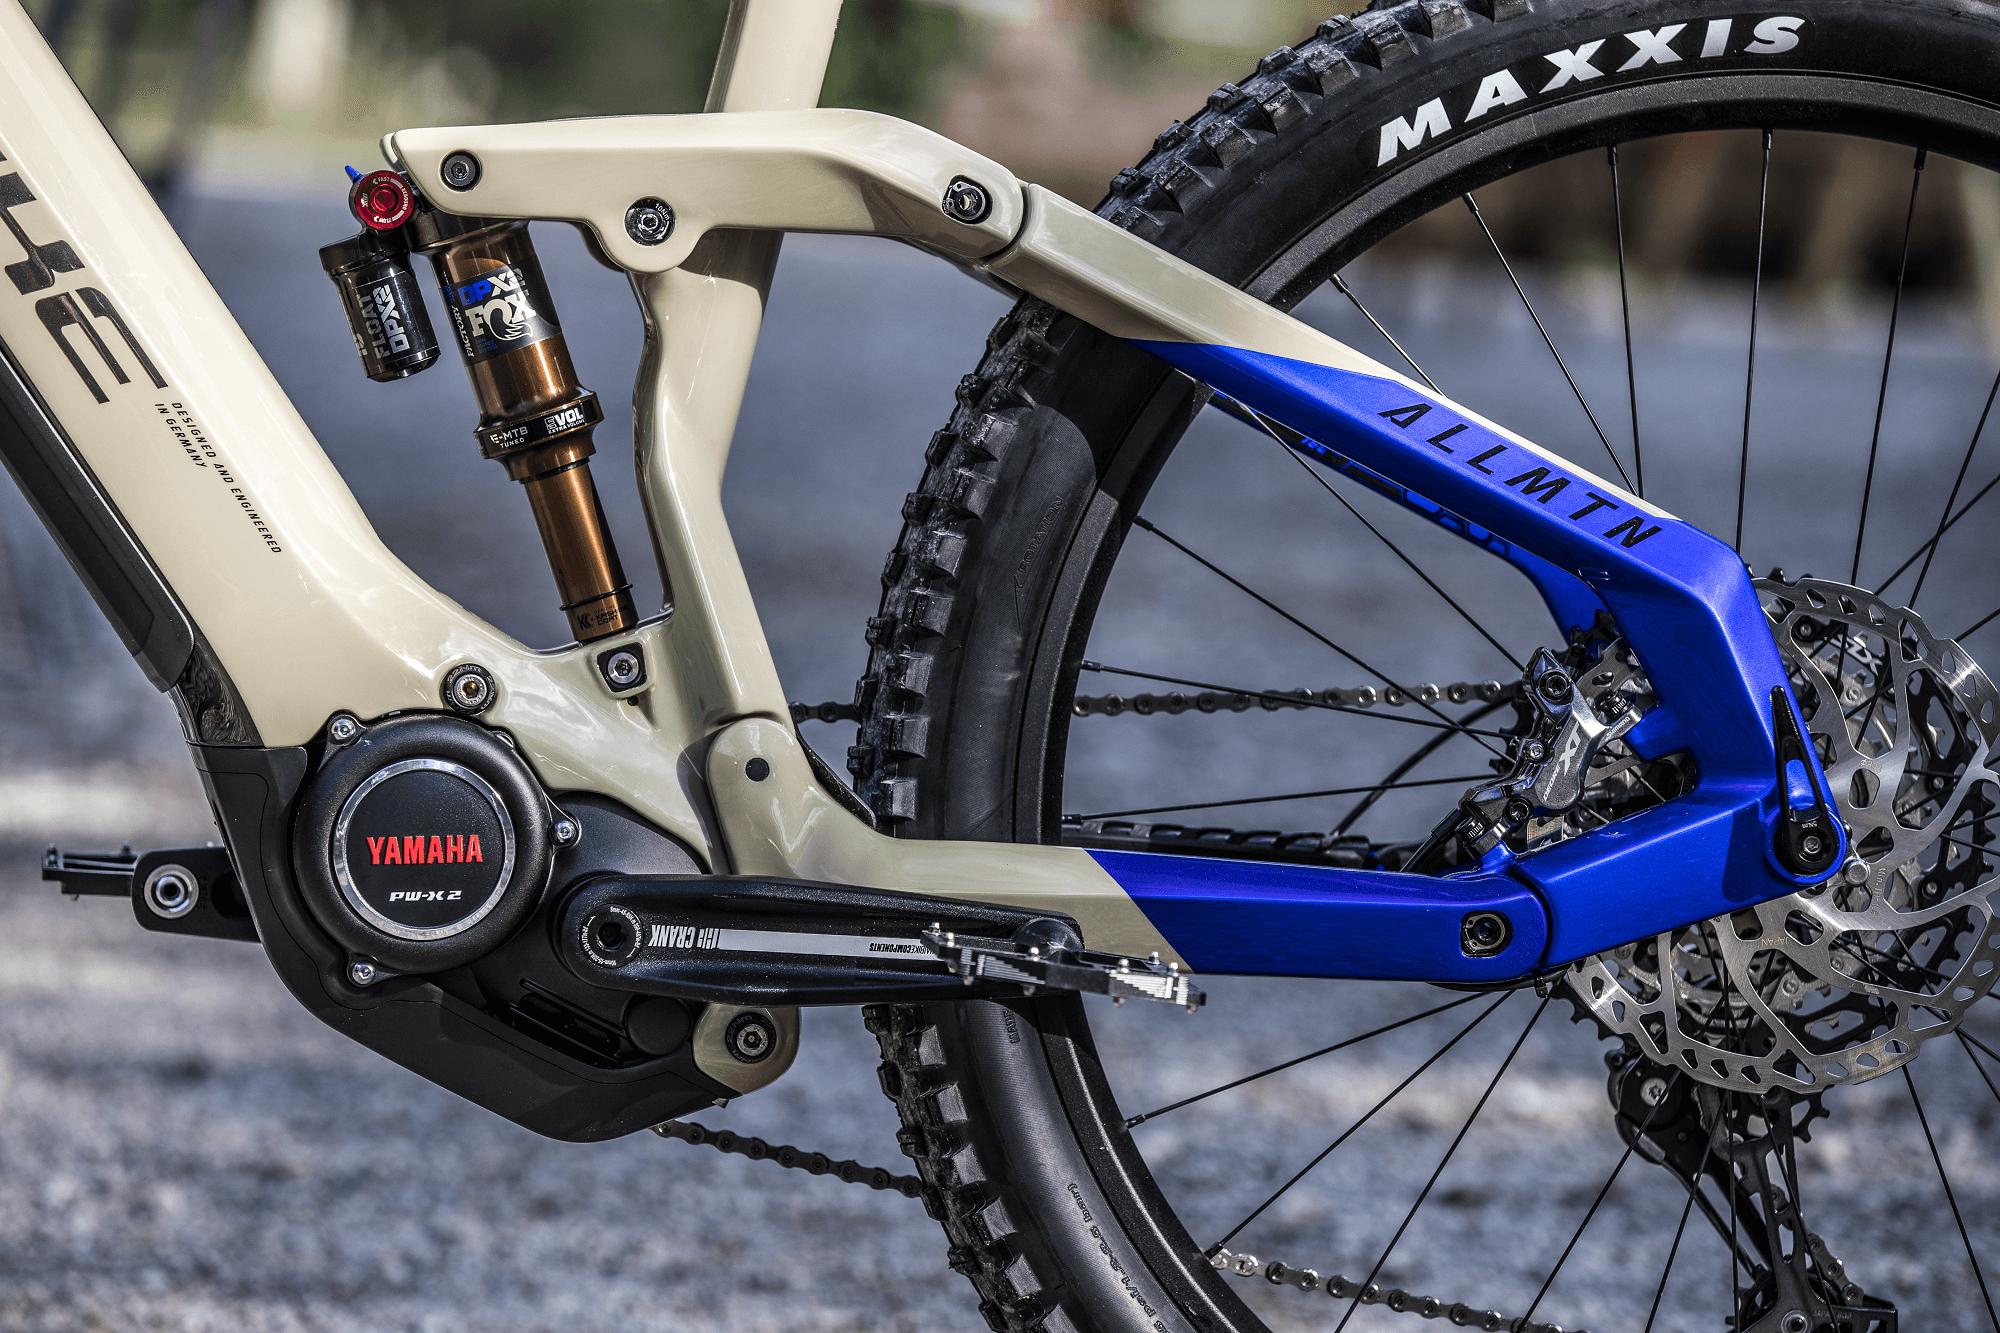 Detailbild Yamaha PW-X2 Motor